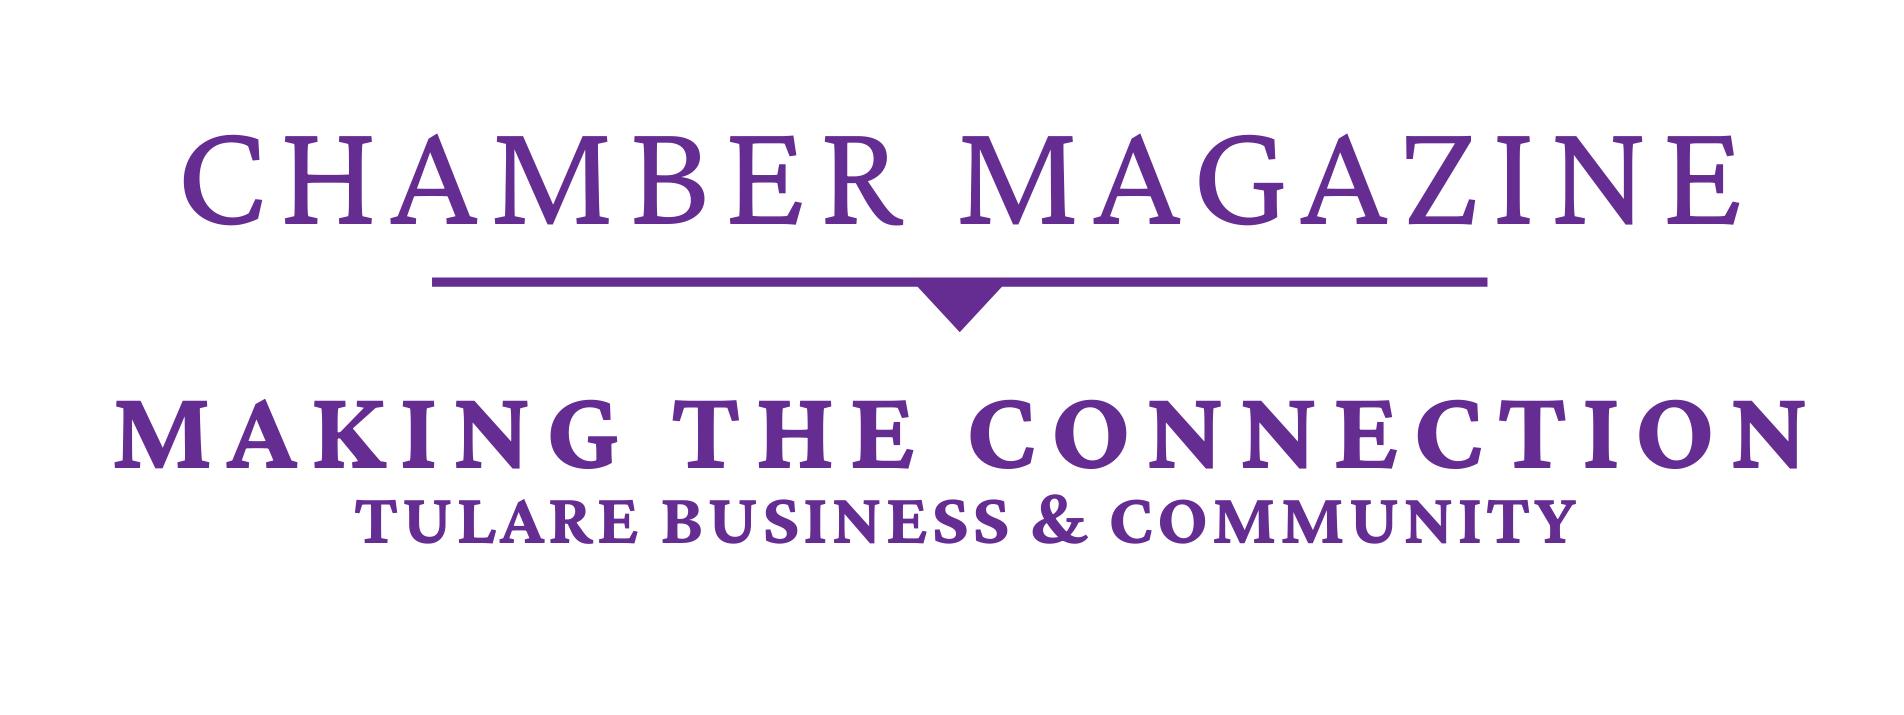 Chamber-Magazine---Website-Banner.png